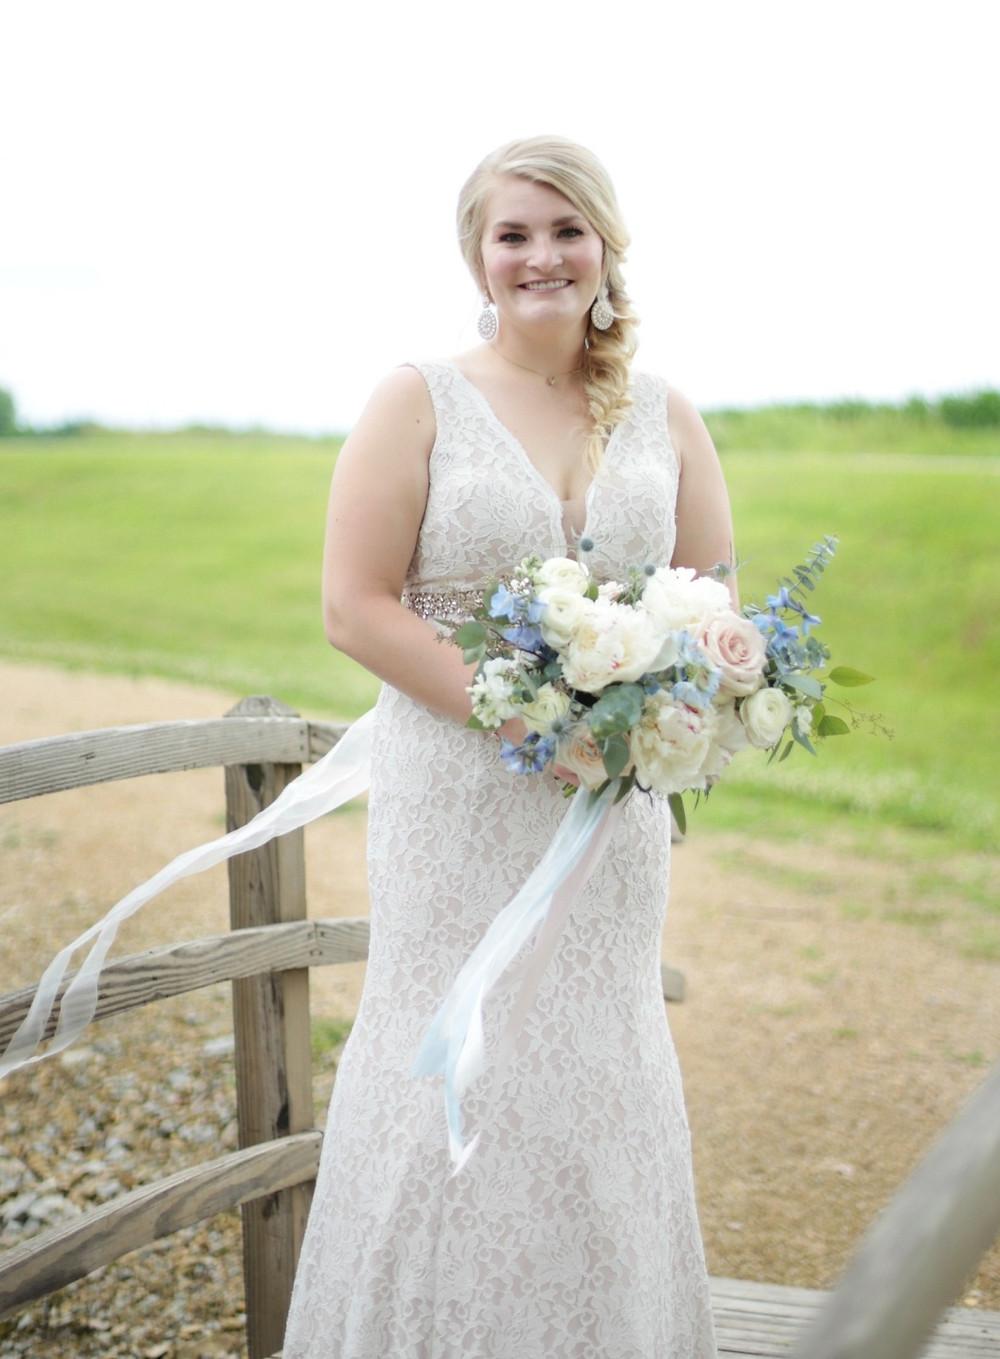 Bride holding Studio Bloom Iowa bridal bouquet in blush and blue with peonies, roses, ranunculus, delphinium, and eucalyptus